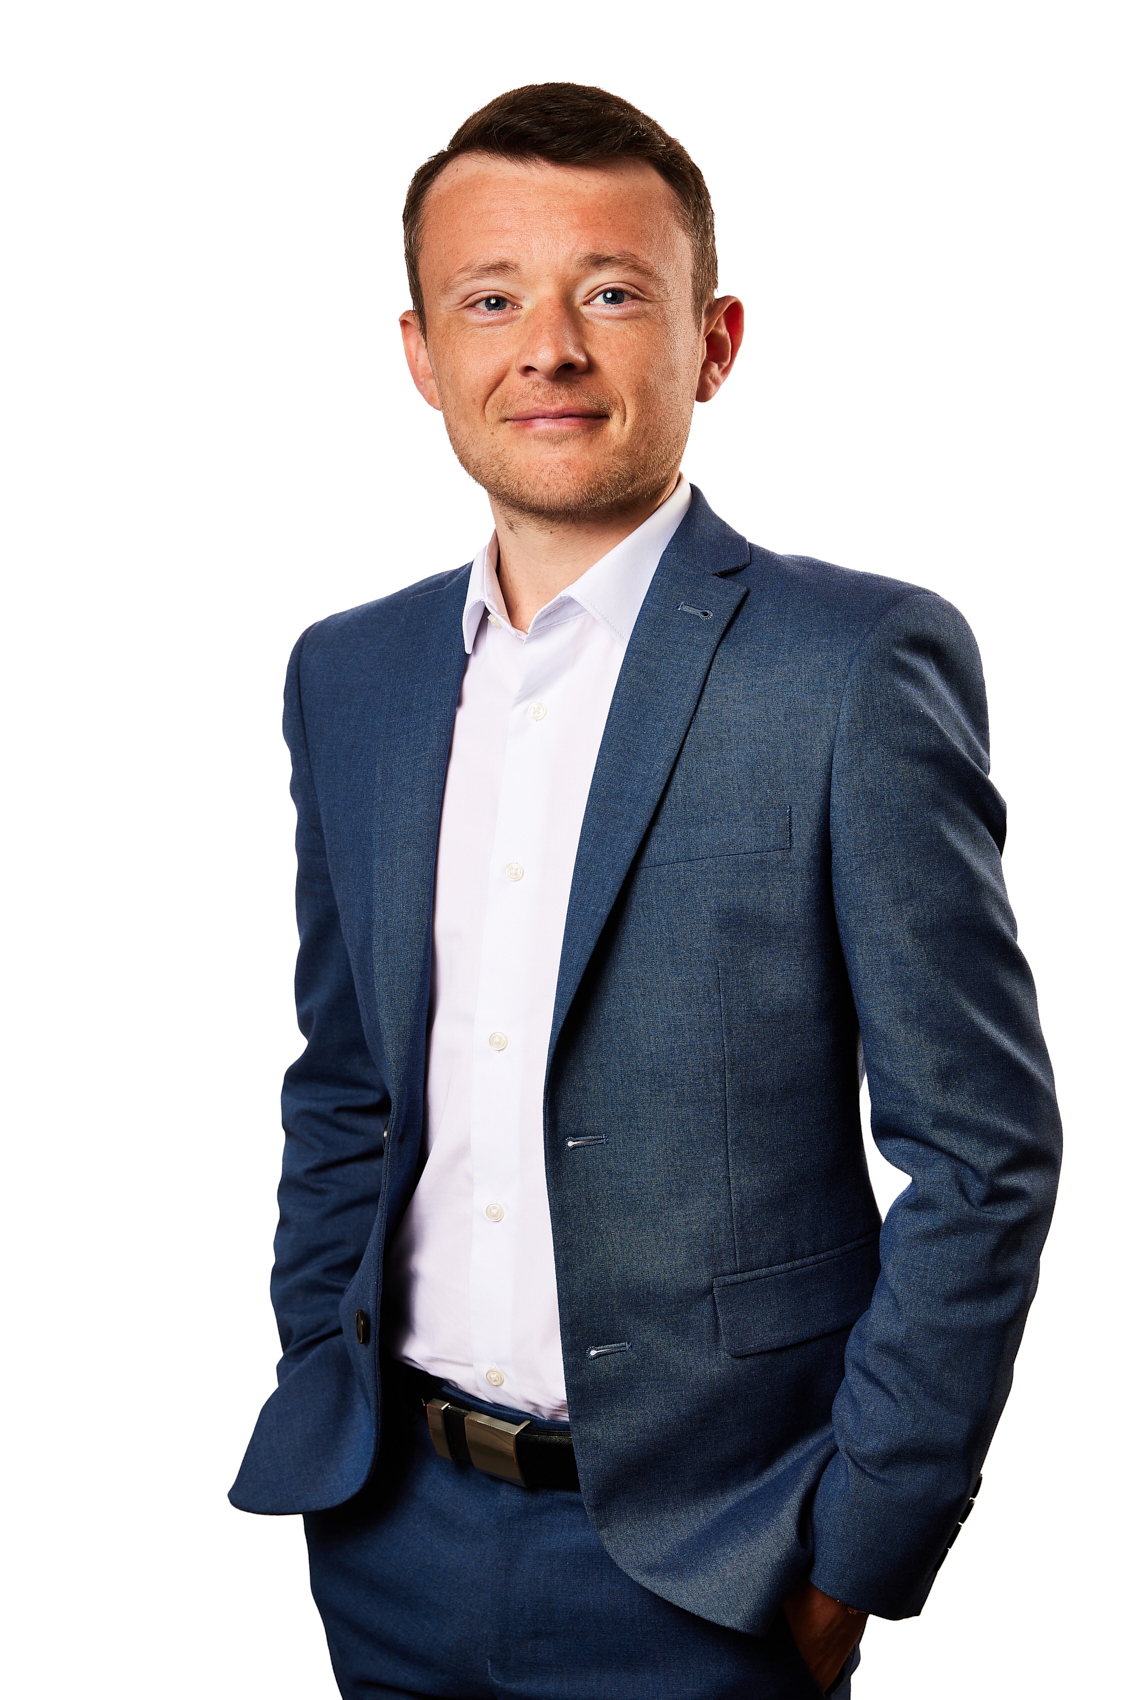 Kieran Conlon - Family & Employment Paralegal